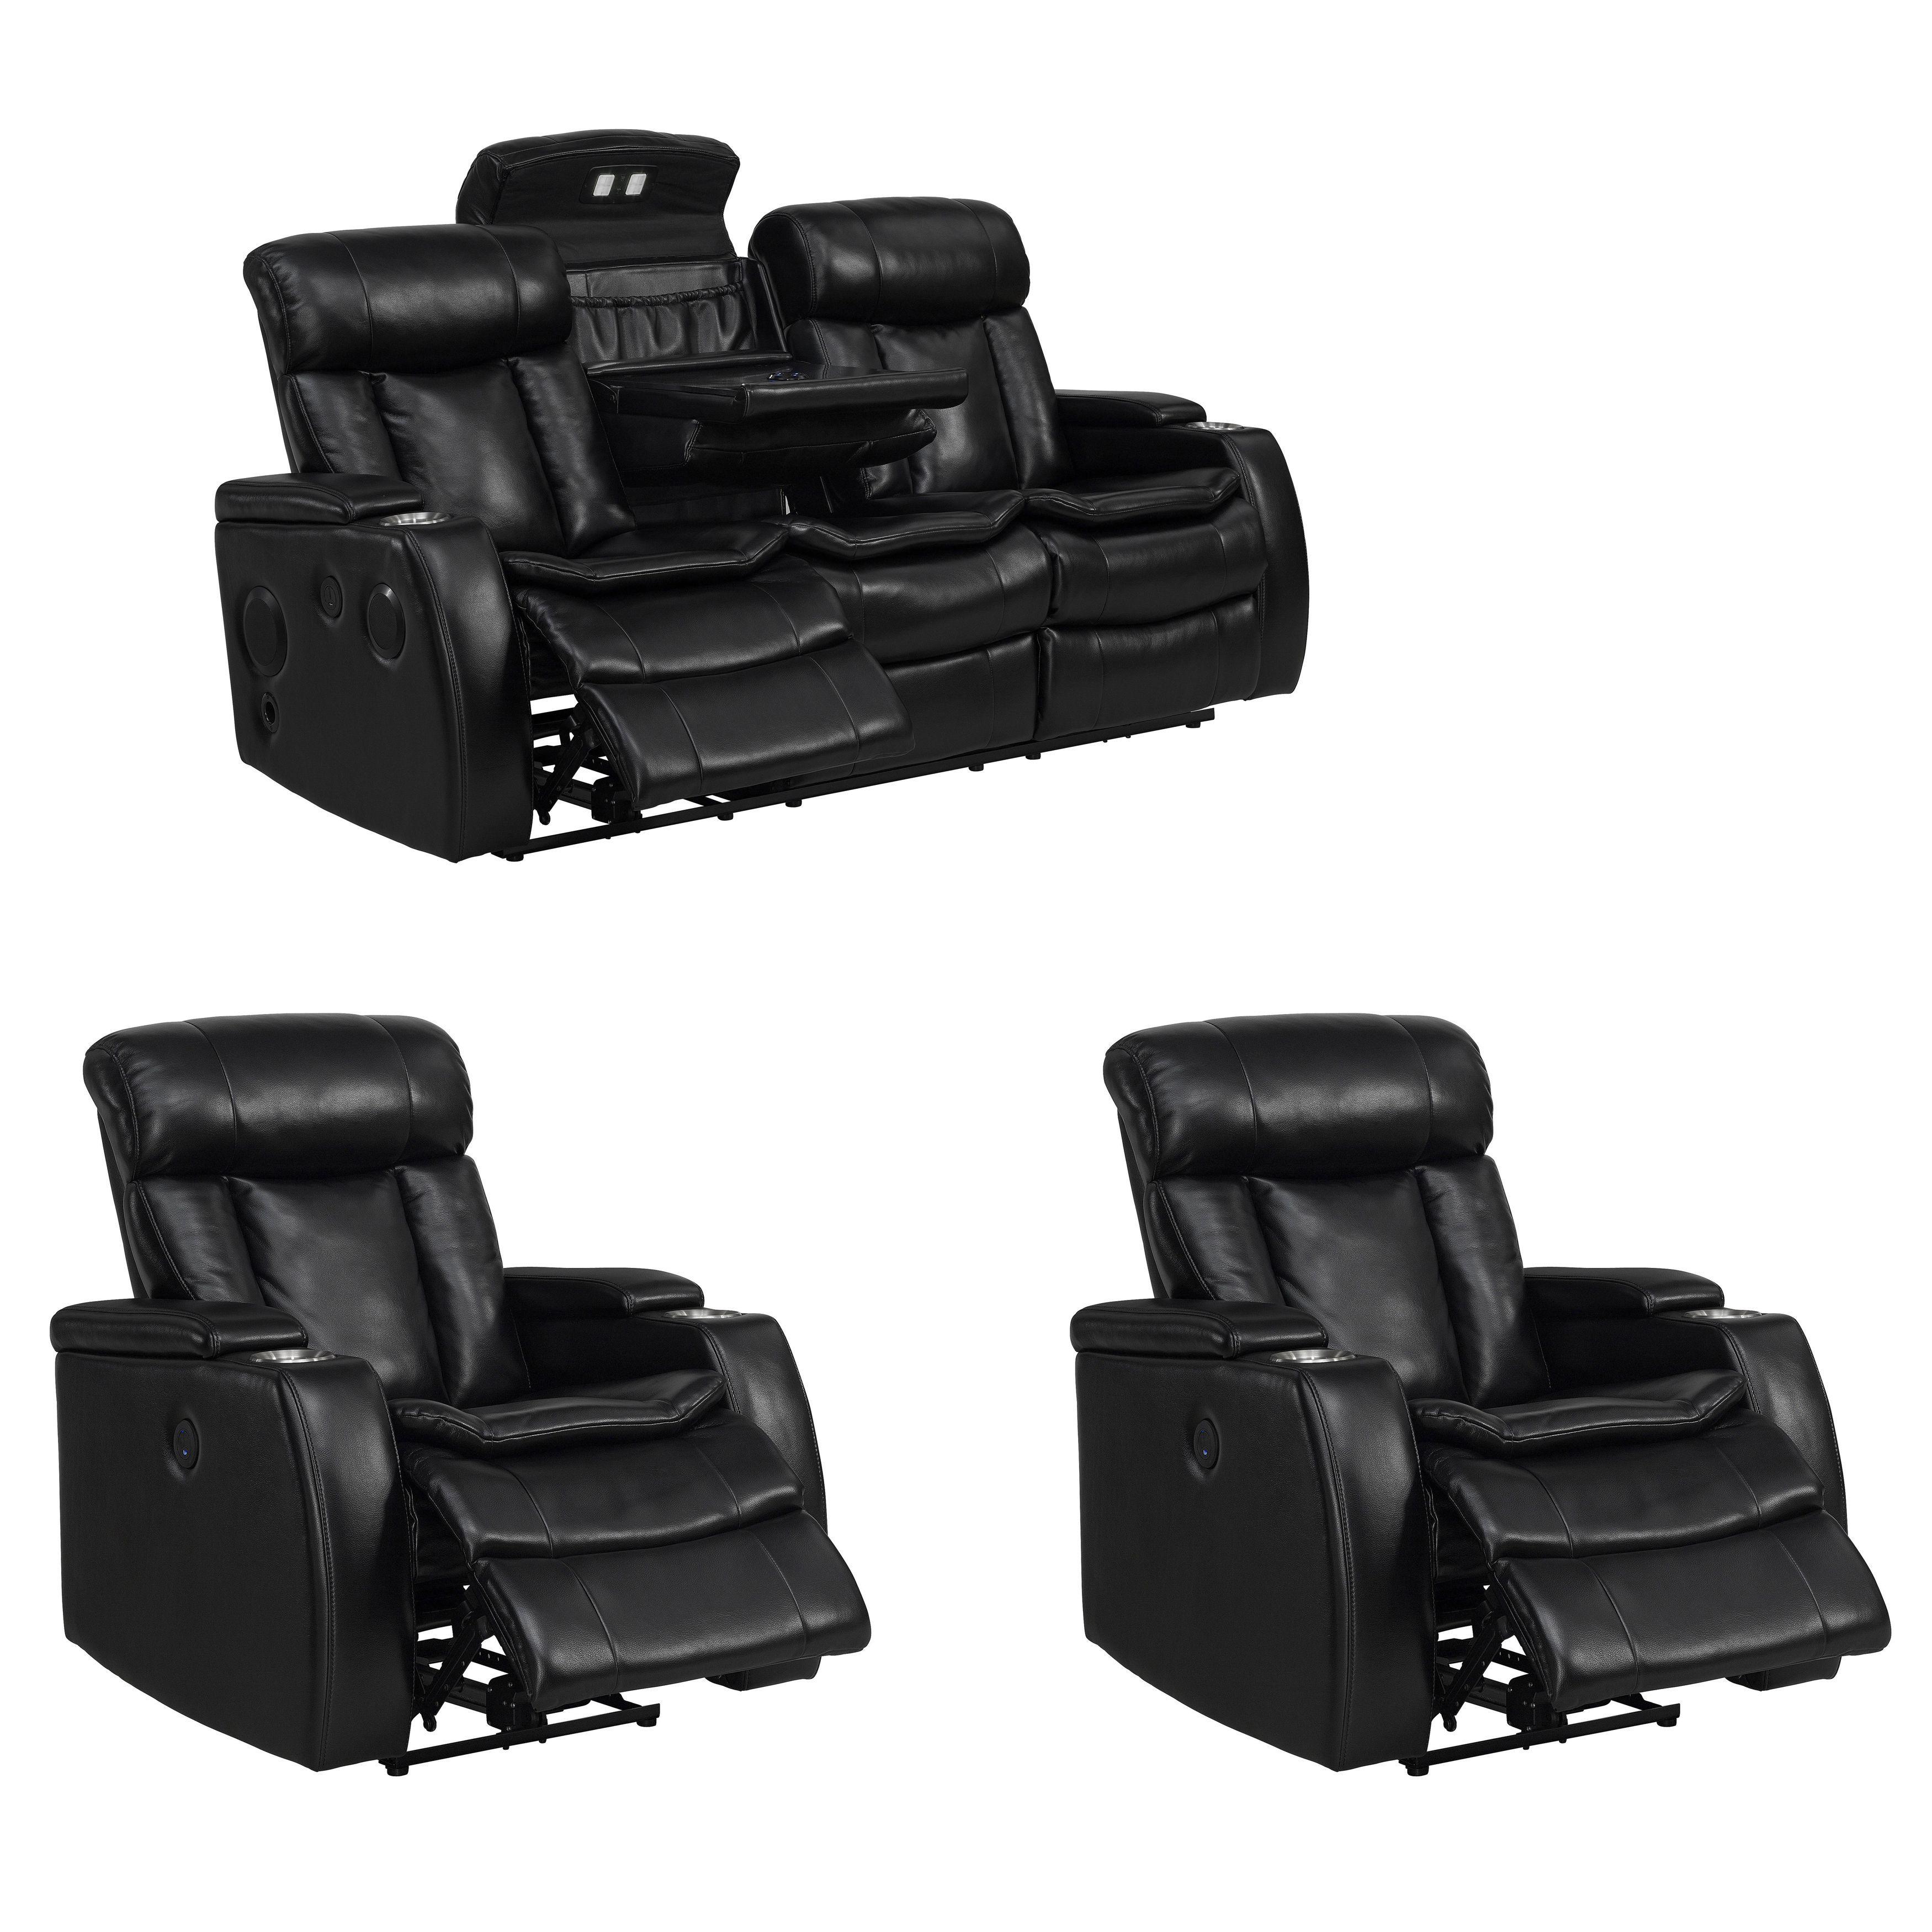 Fine Smart Tech Bluetooth Power Reclining Sofa And Two Chairs Machost Co Dining Chair Design Ideas Machostcouk